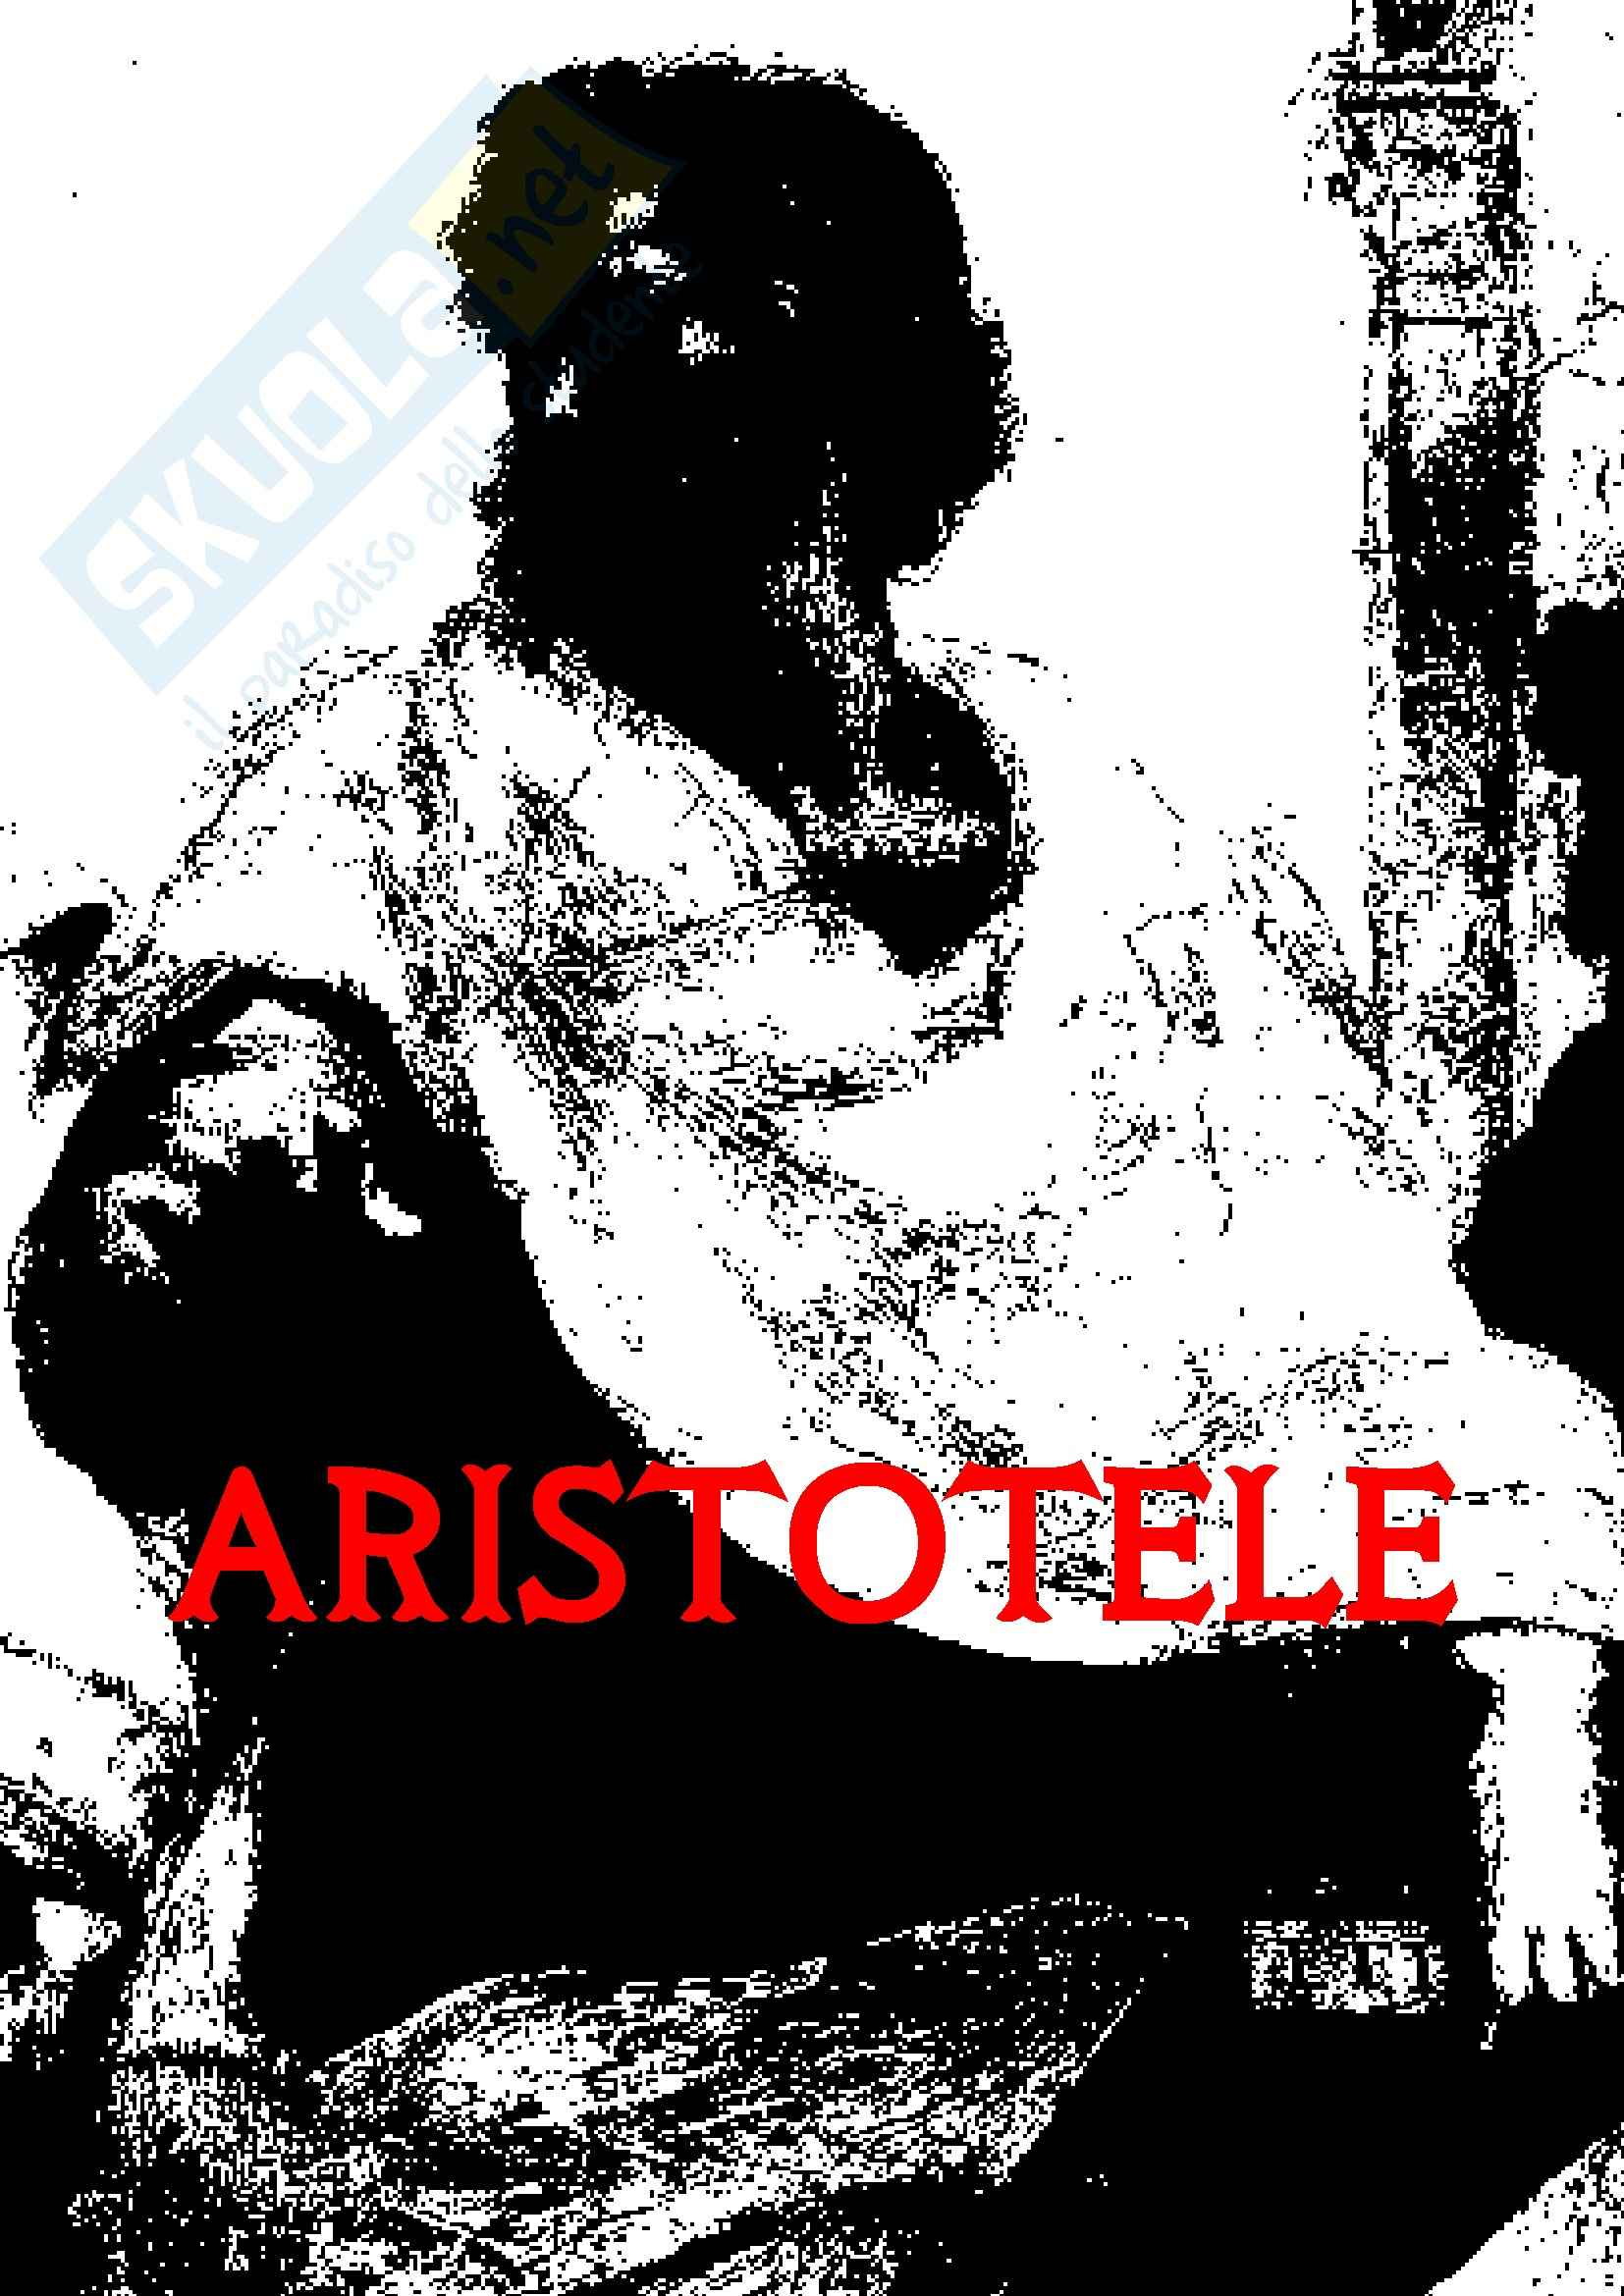 Estetica - Aristotele